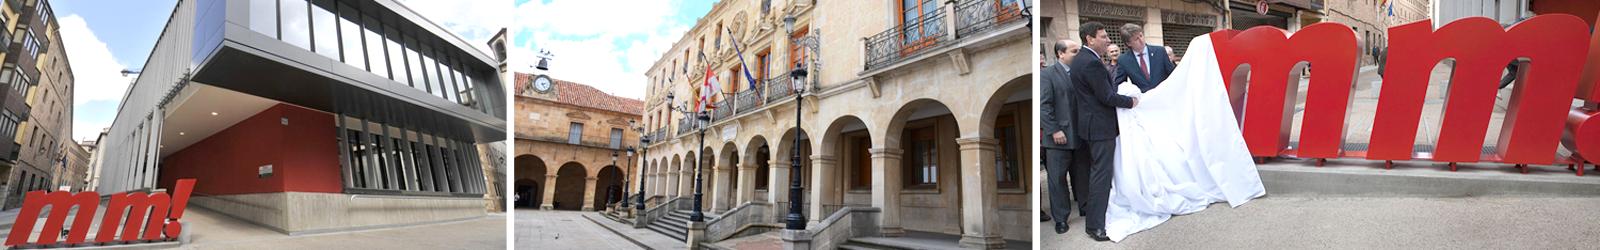 Mercado Municipal de Soria